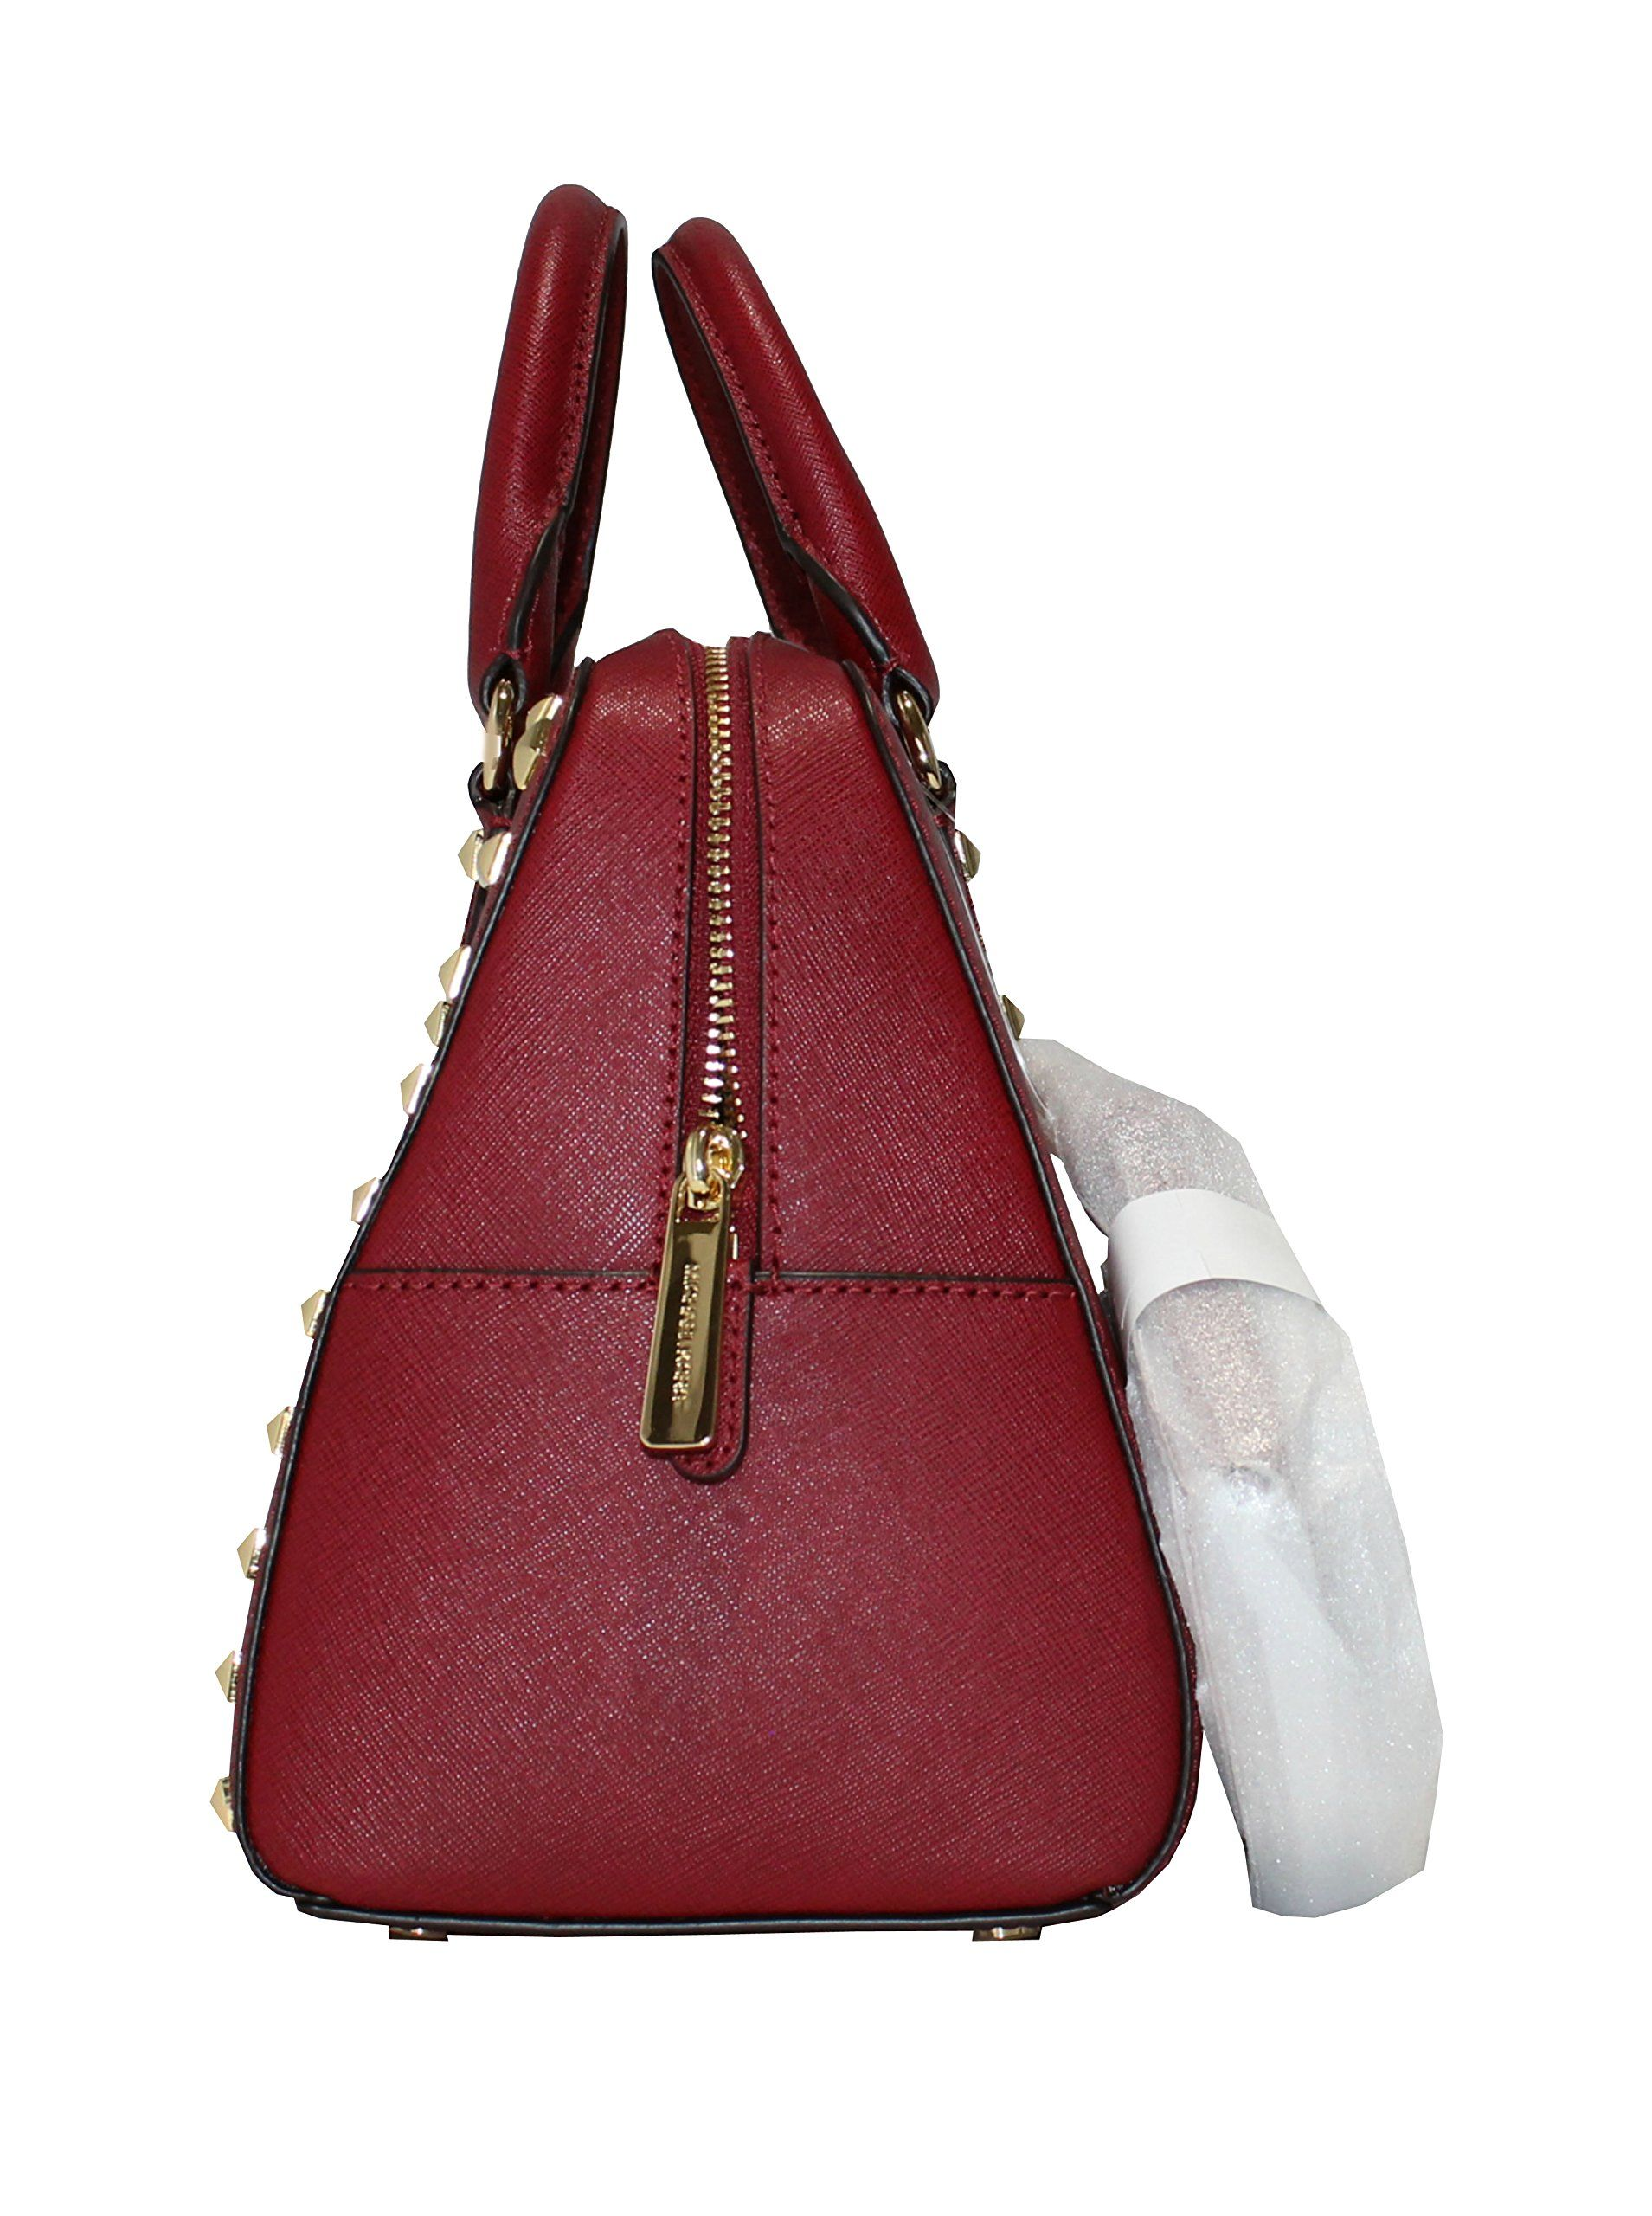 6b521fdbee7b MICHAEL Michael Kors Womens Sandrine Studded Saffiano Leather SMALL Satchel  Handbag Cherry ** Want to know more, click on the image.